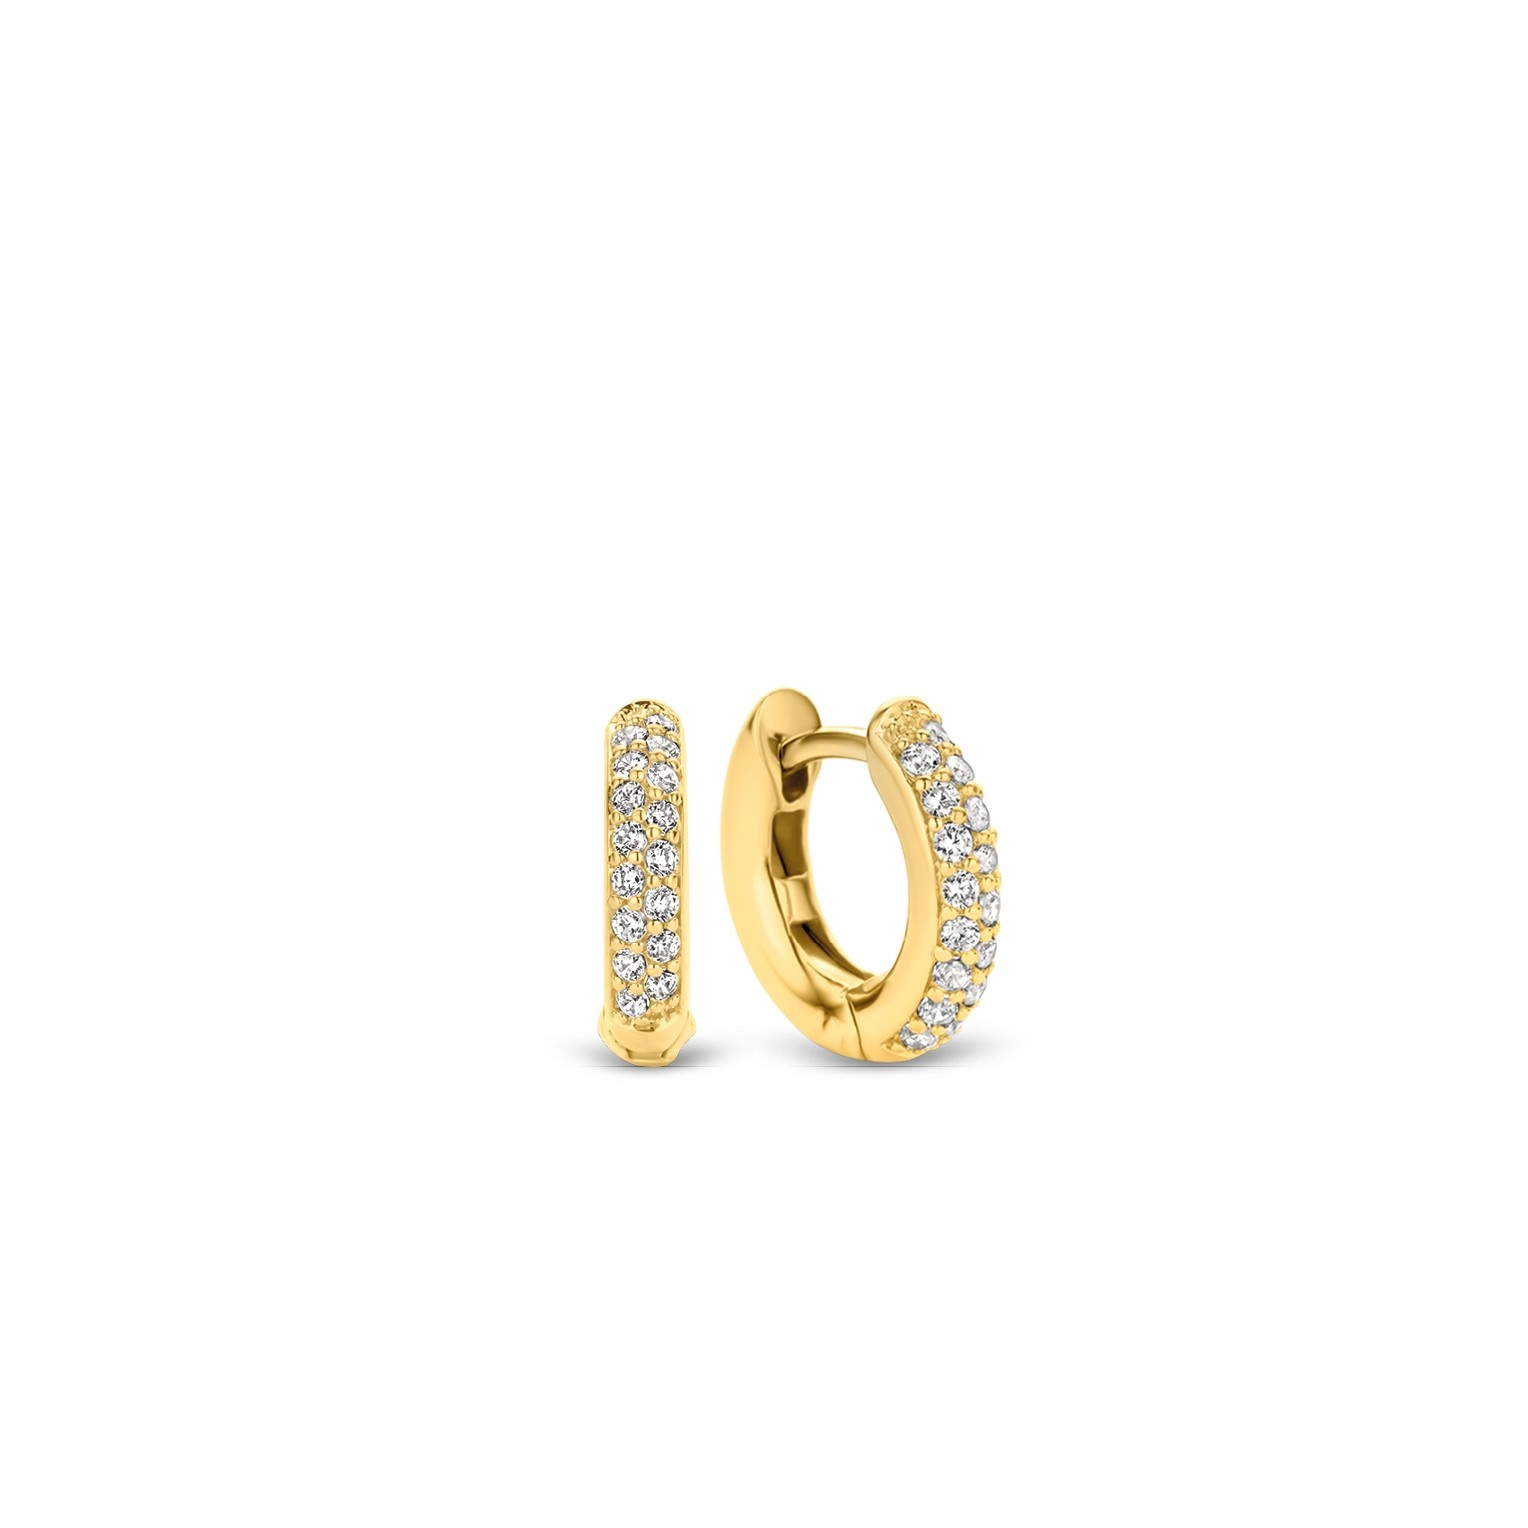 TI SENTO - Milano Earrings 7210ZY-1